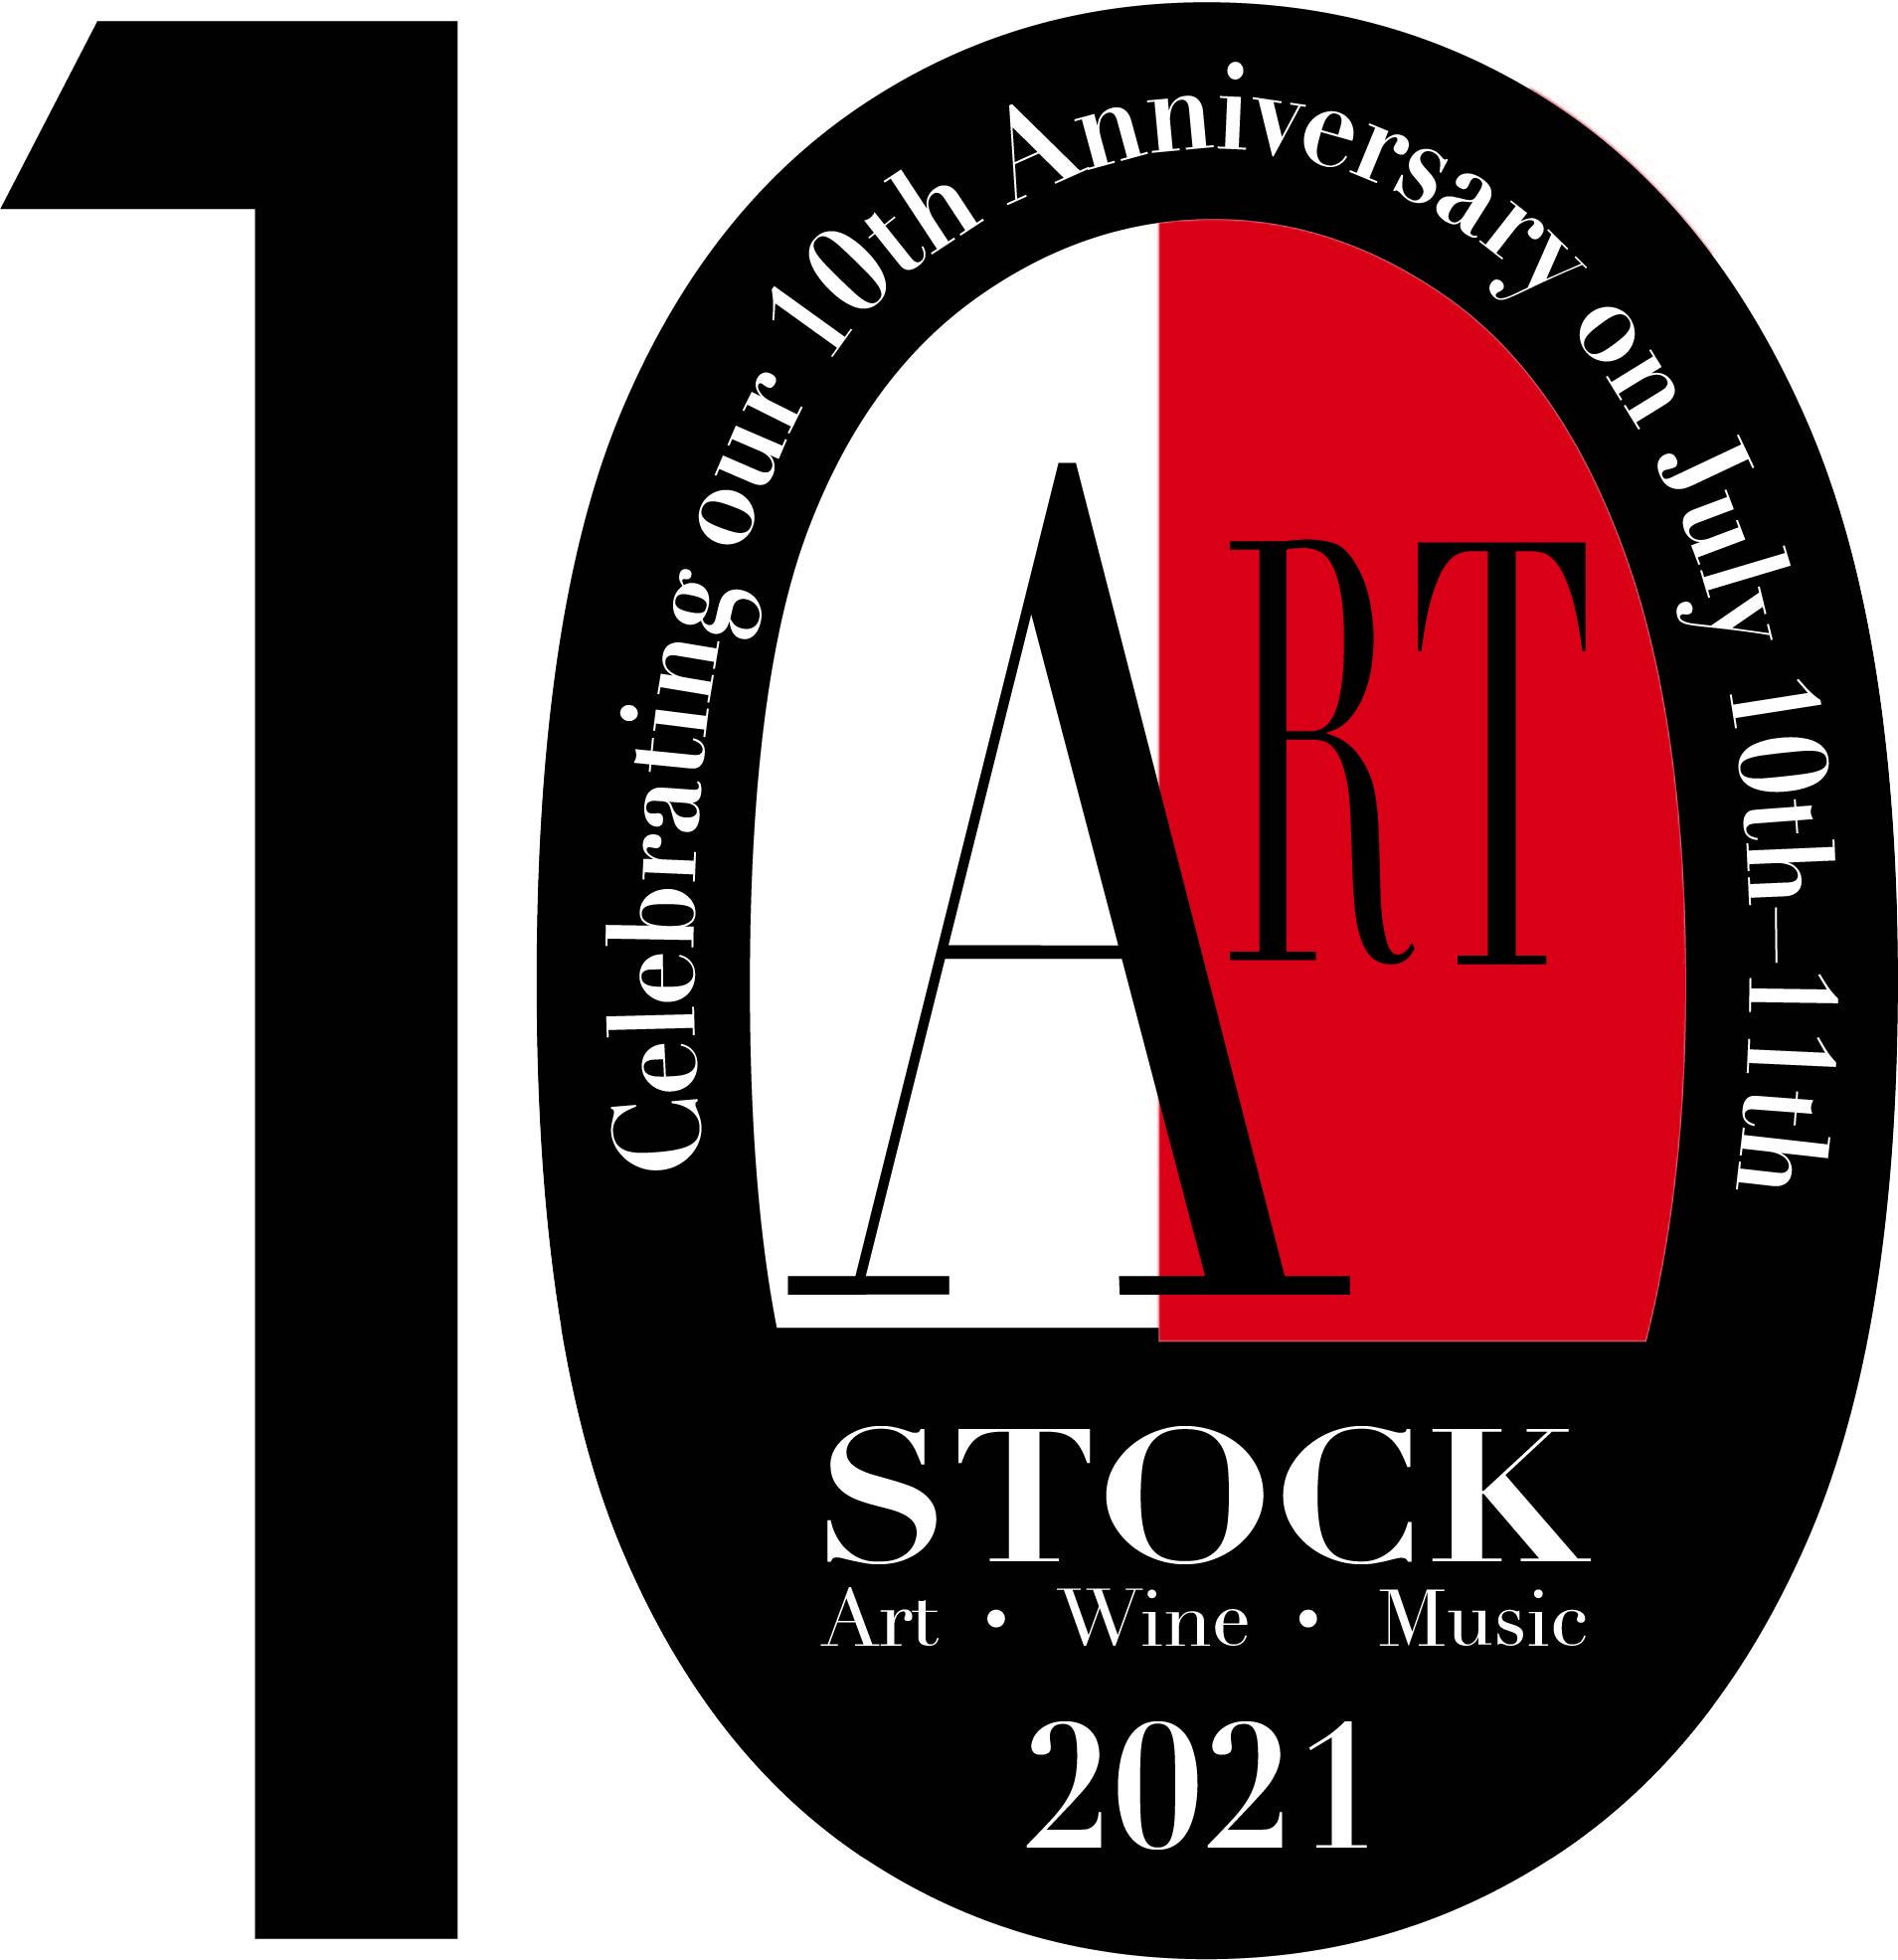 ArtStock 2021 logo